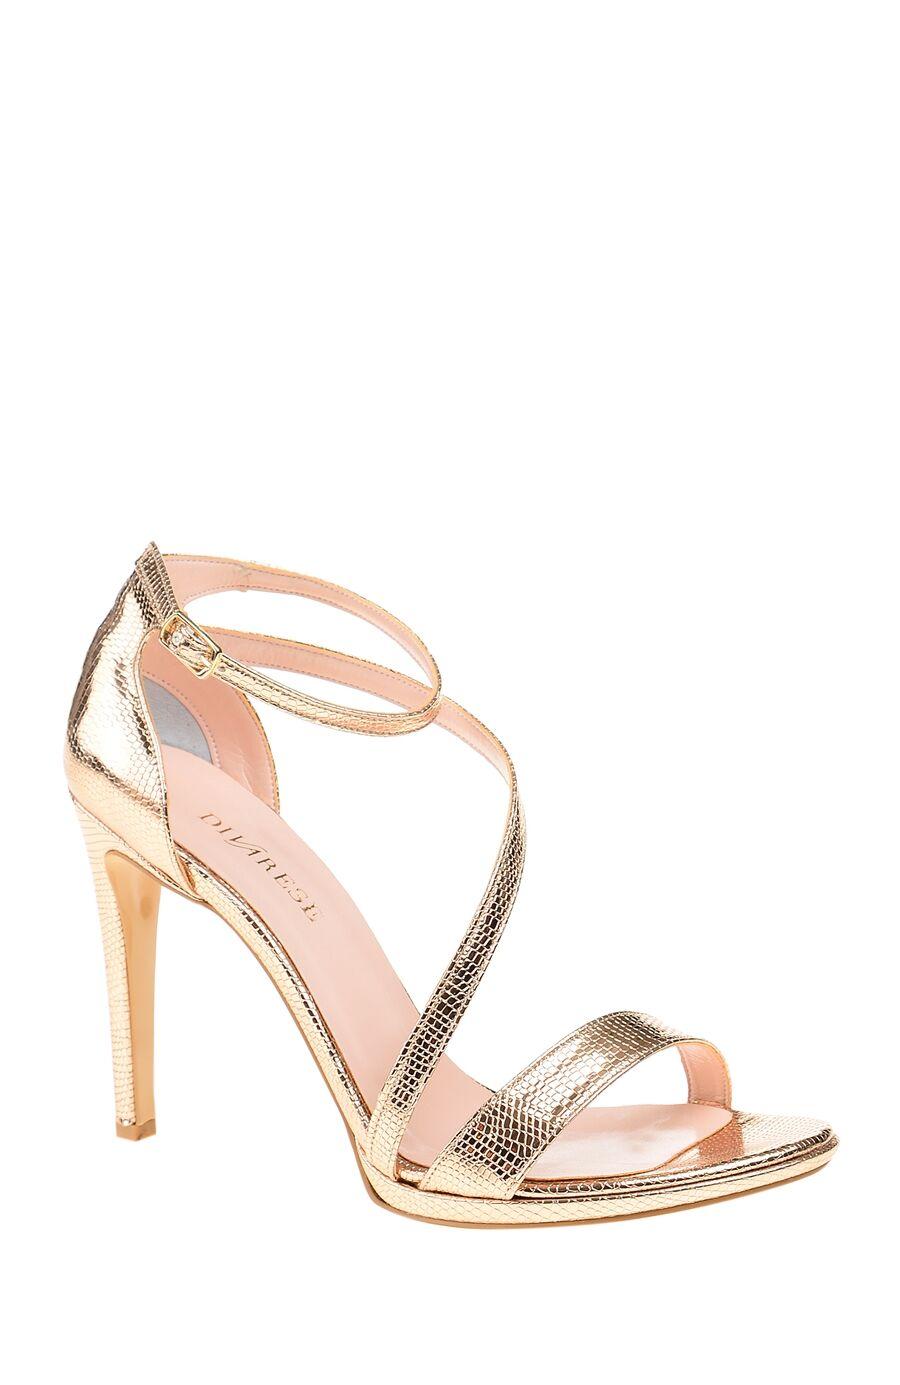 Dıvarese Platformlu Suni Deri Rose Gold Sandalet – 165.0 TL